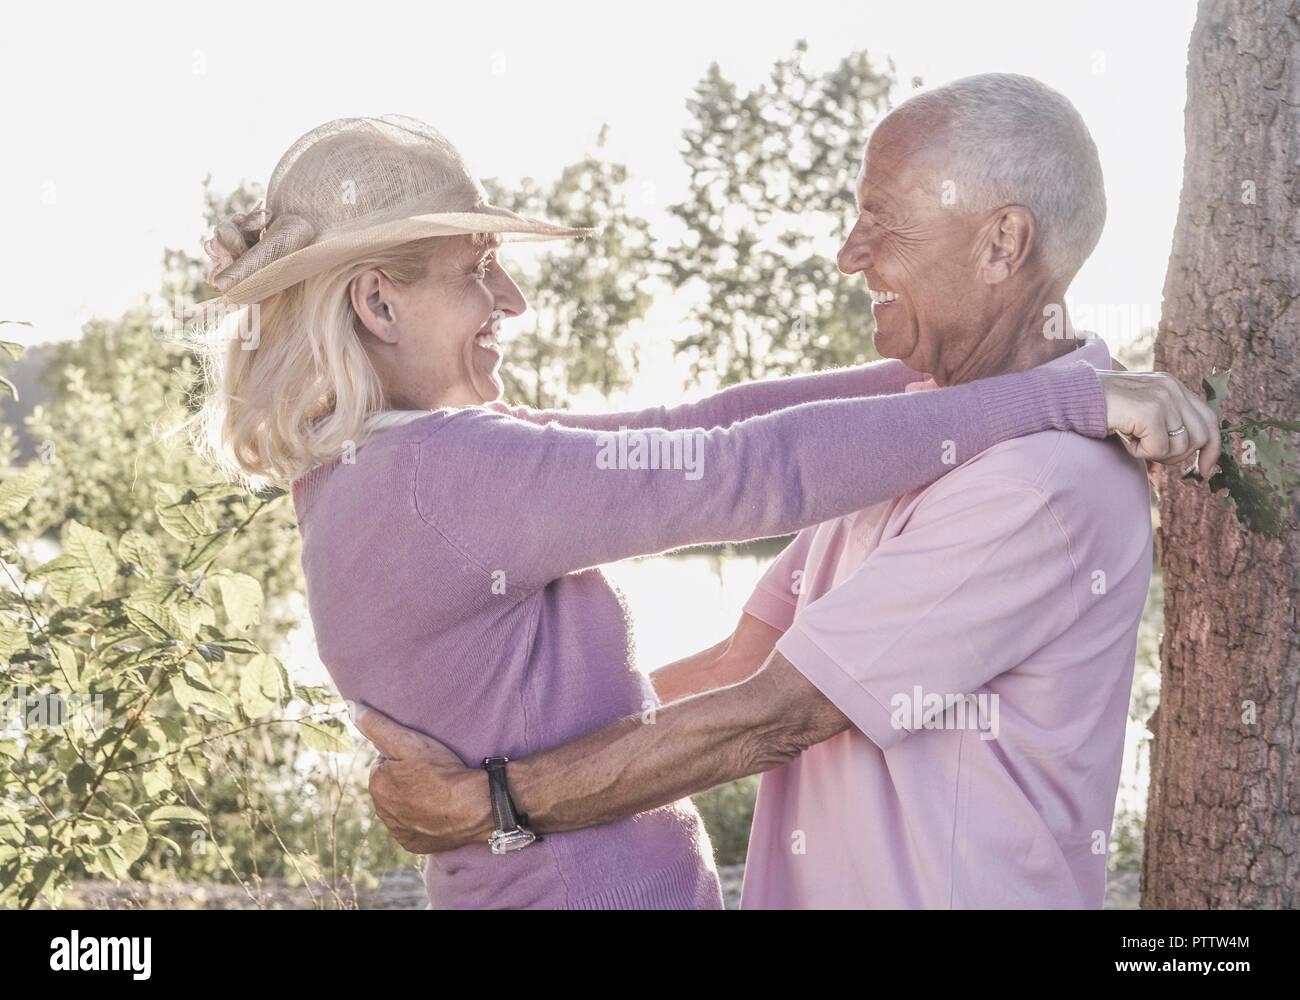 Seniorenpaar an See, umarmen sich lachend (model-released) Stock Photo